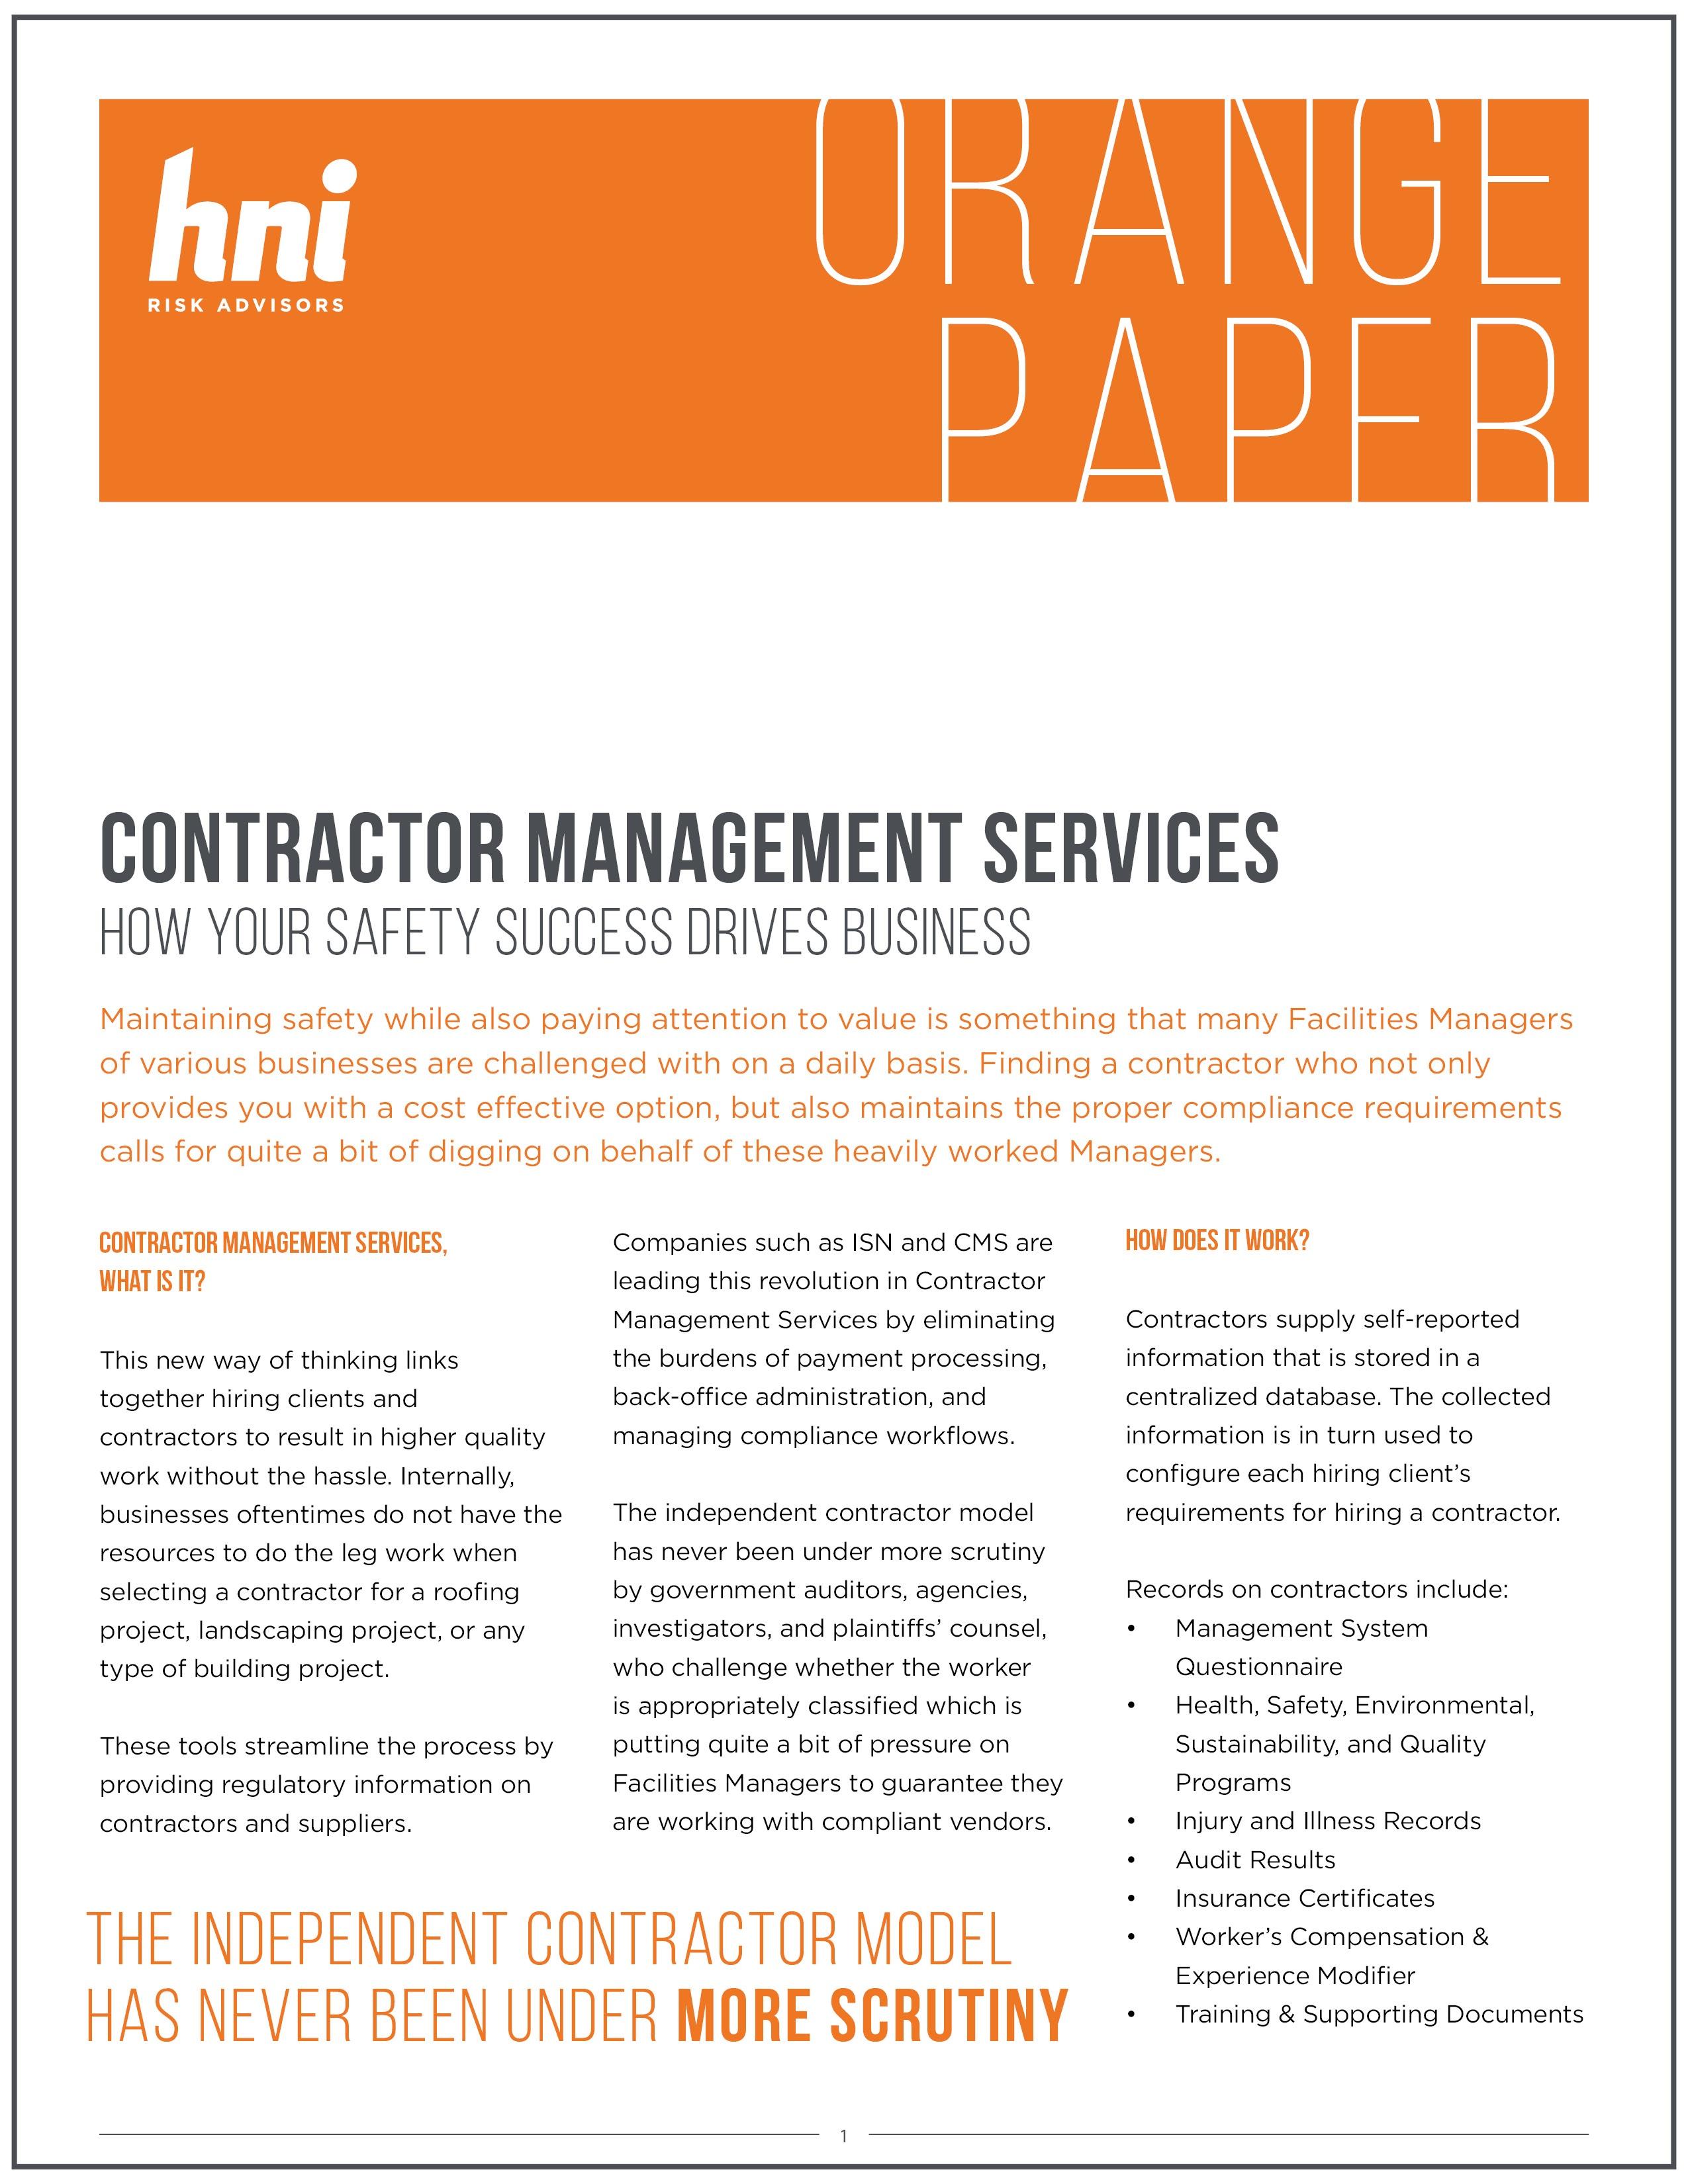 HNI_Orange Paper_Contractor Management Services.jpg